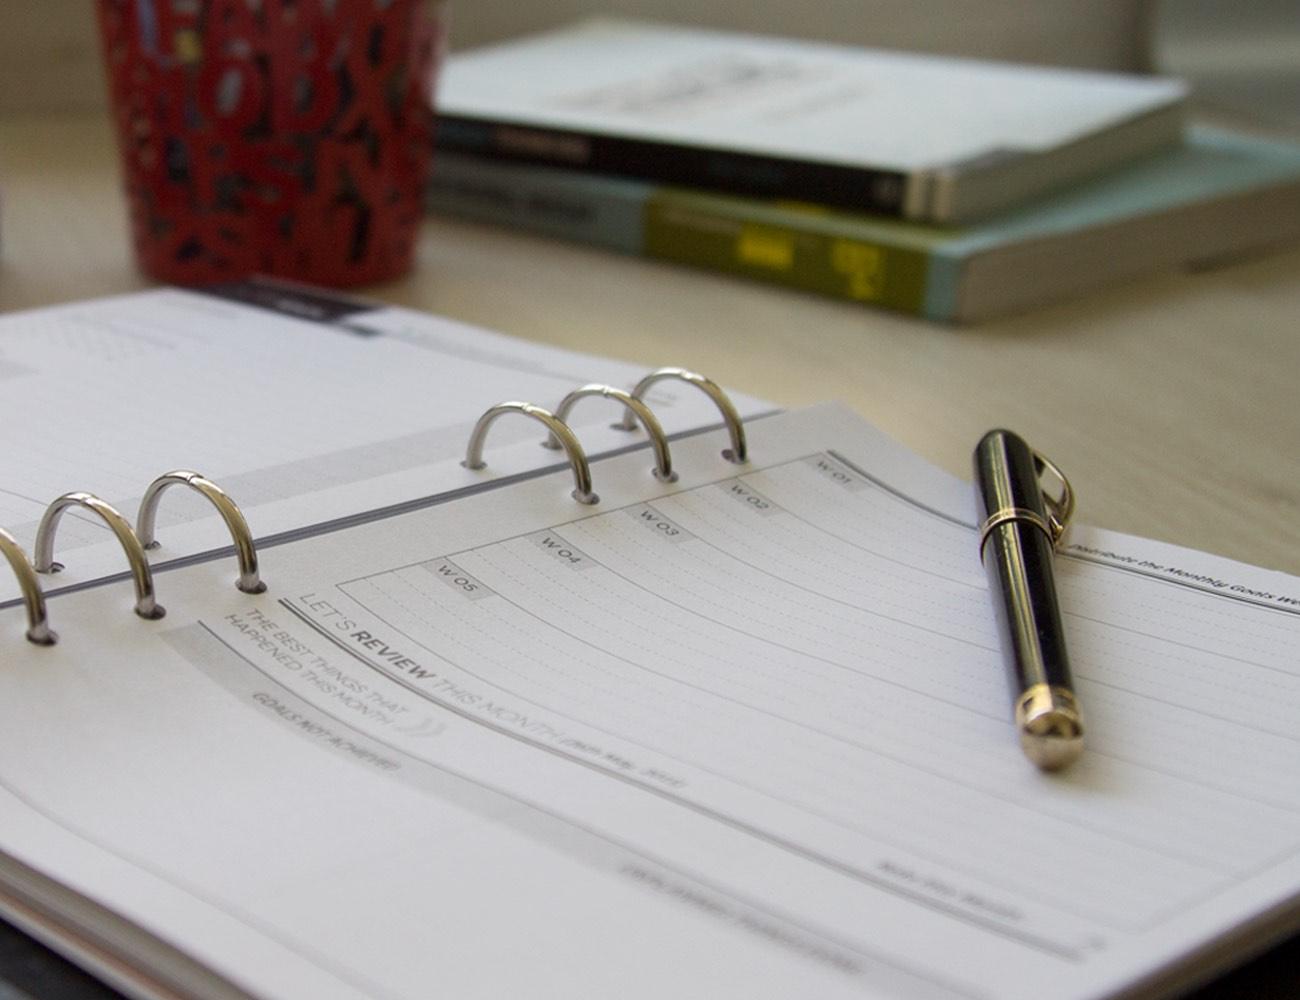 Goal-based Productivity Planner